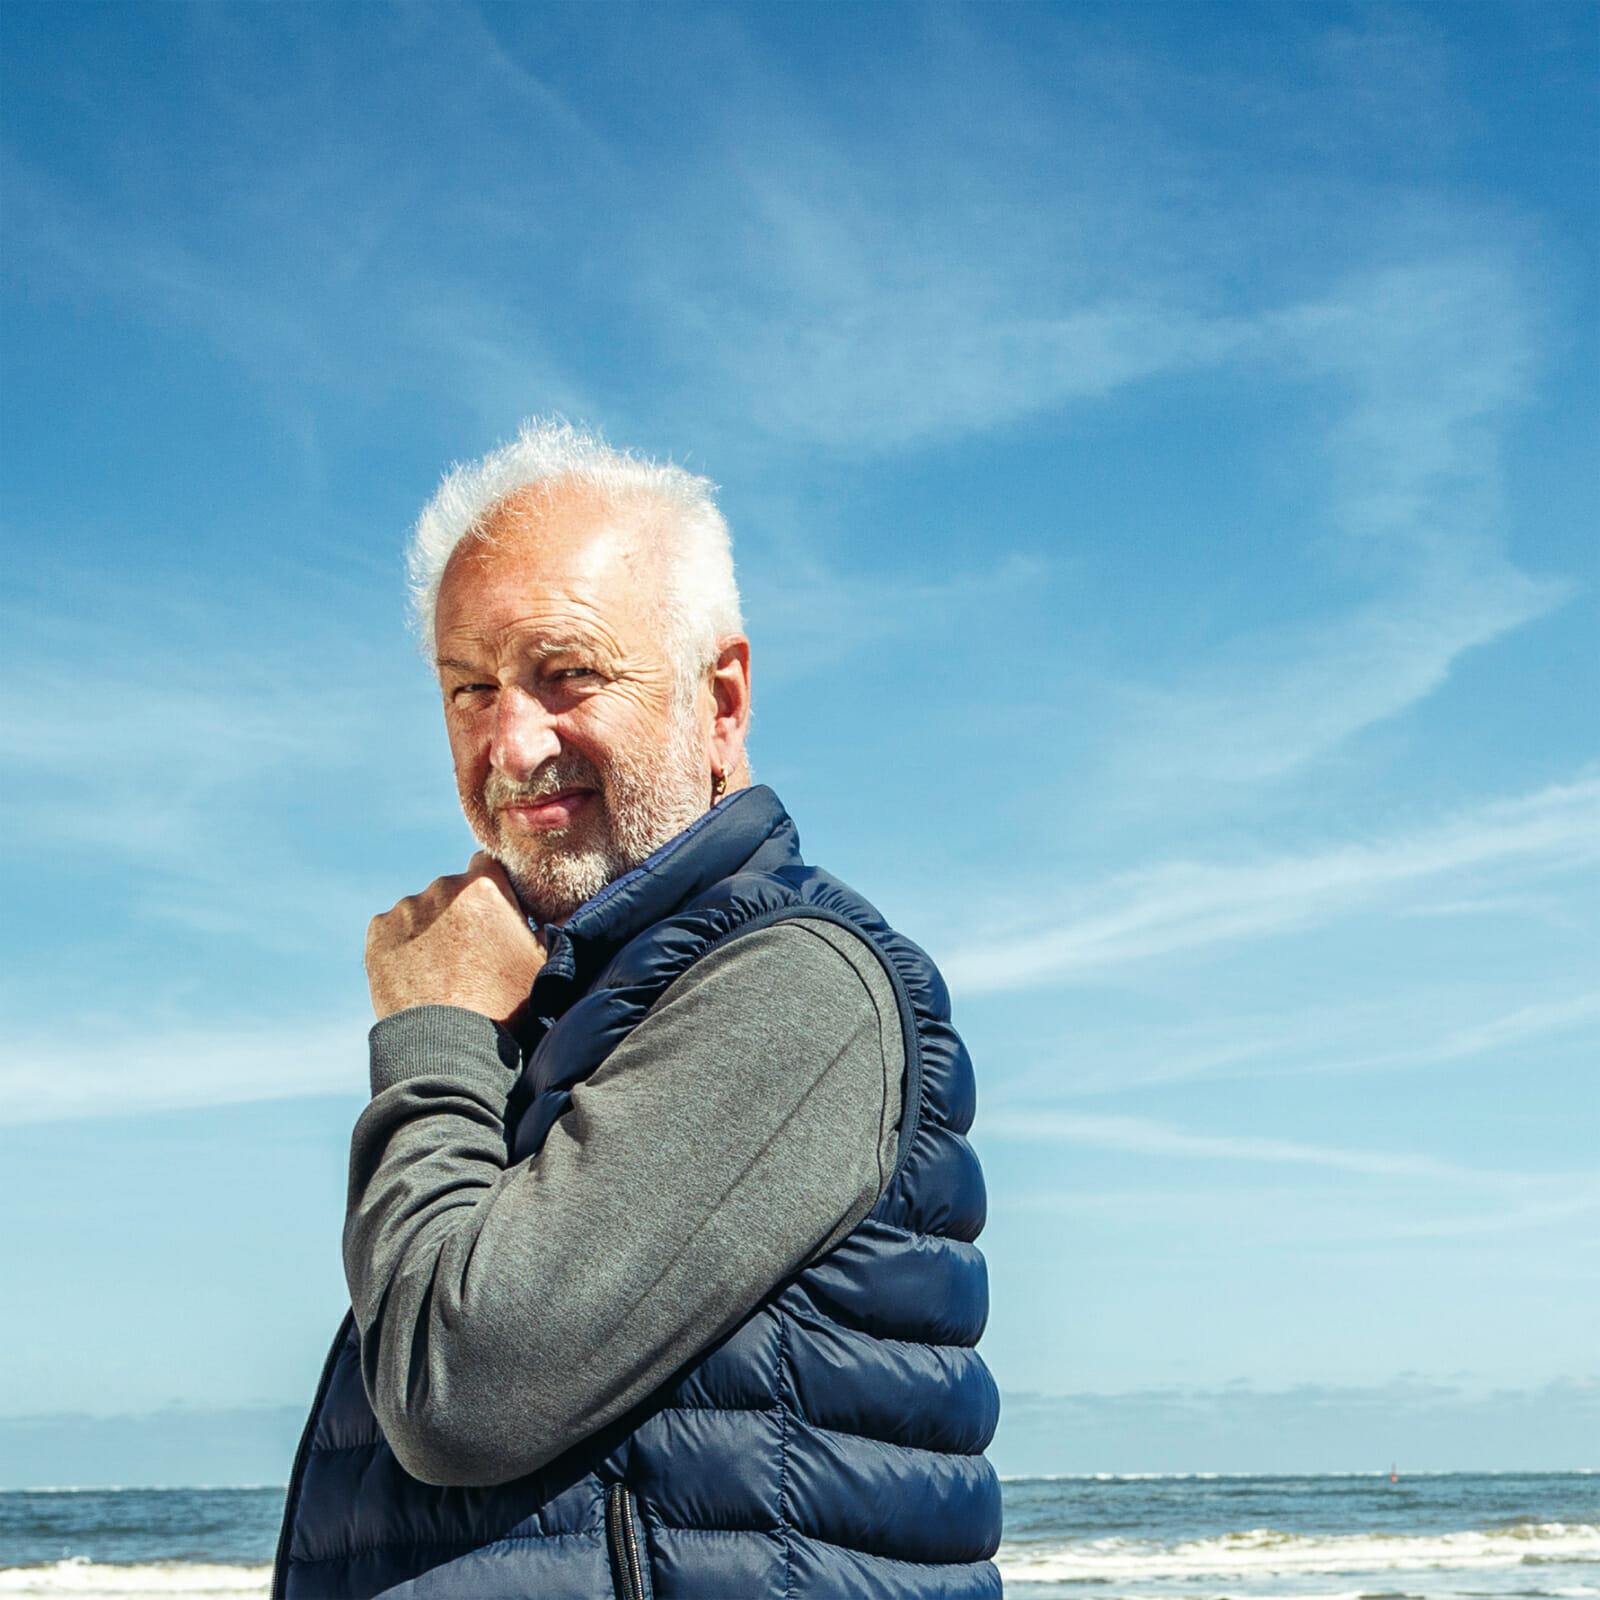 Herbert Visser am Nordstrand von Norderney